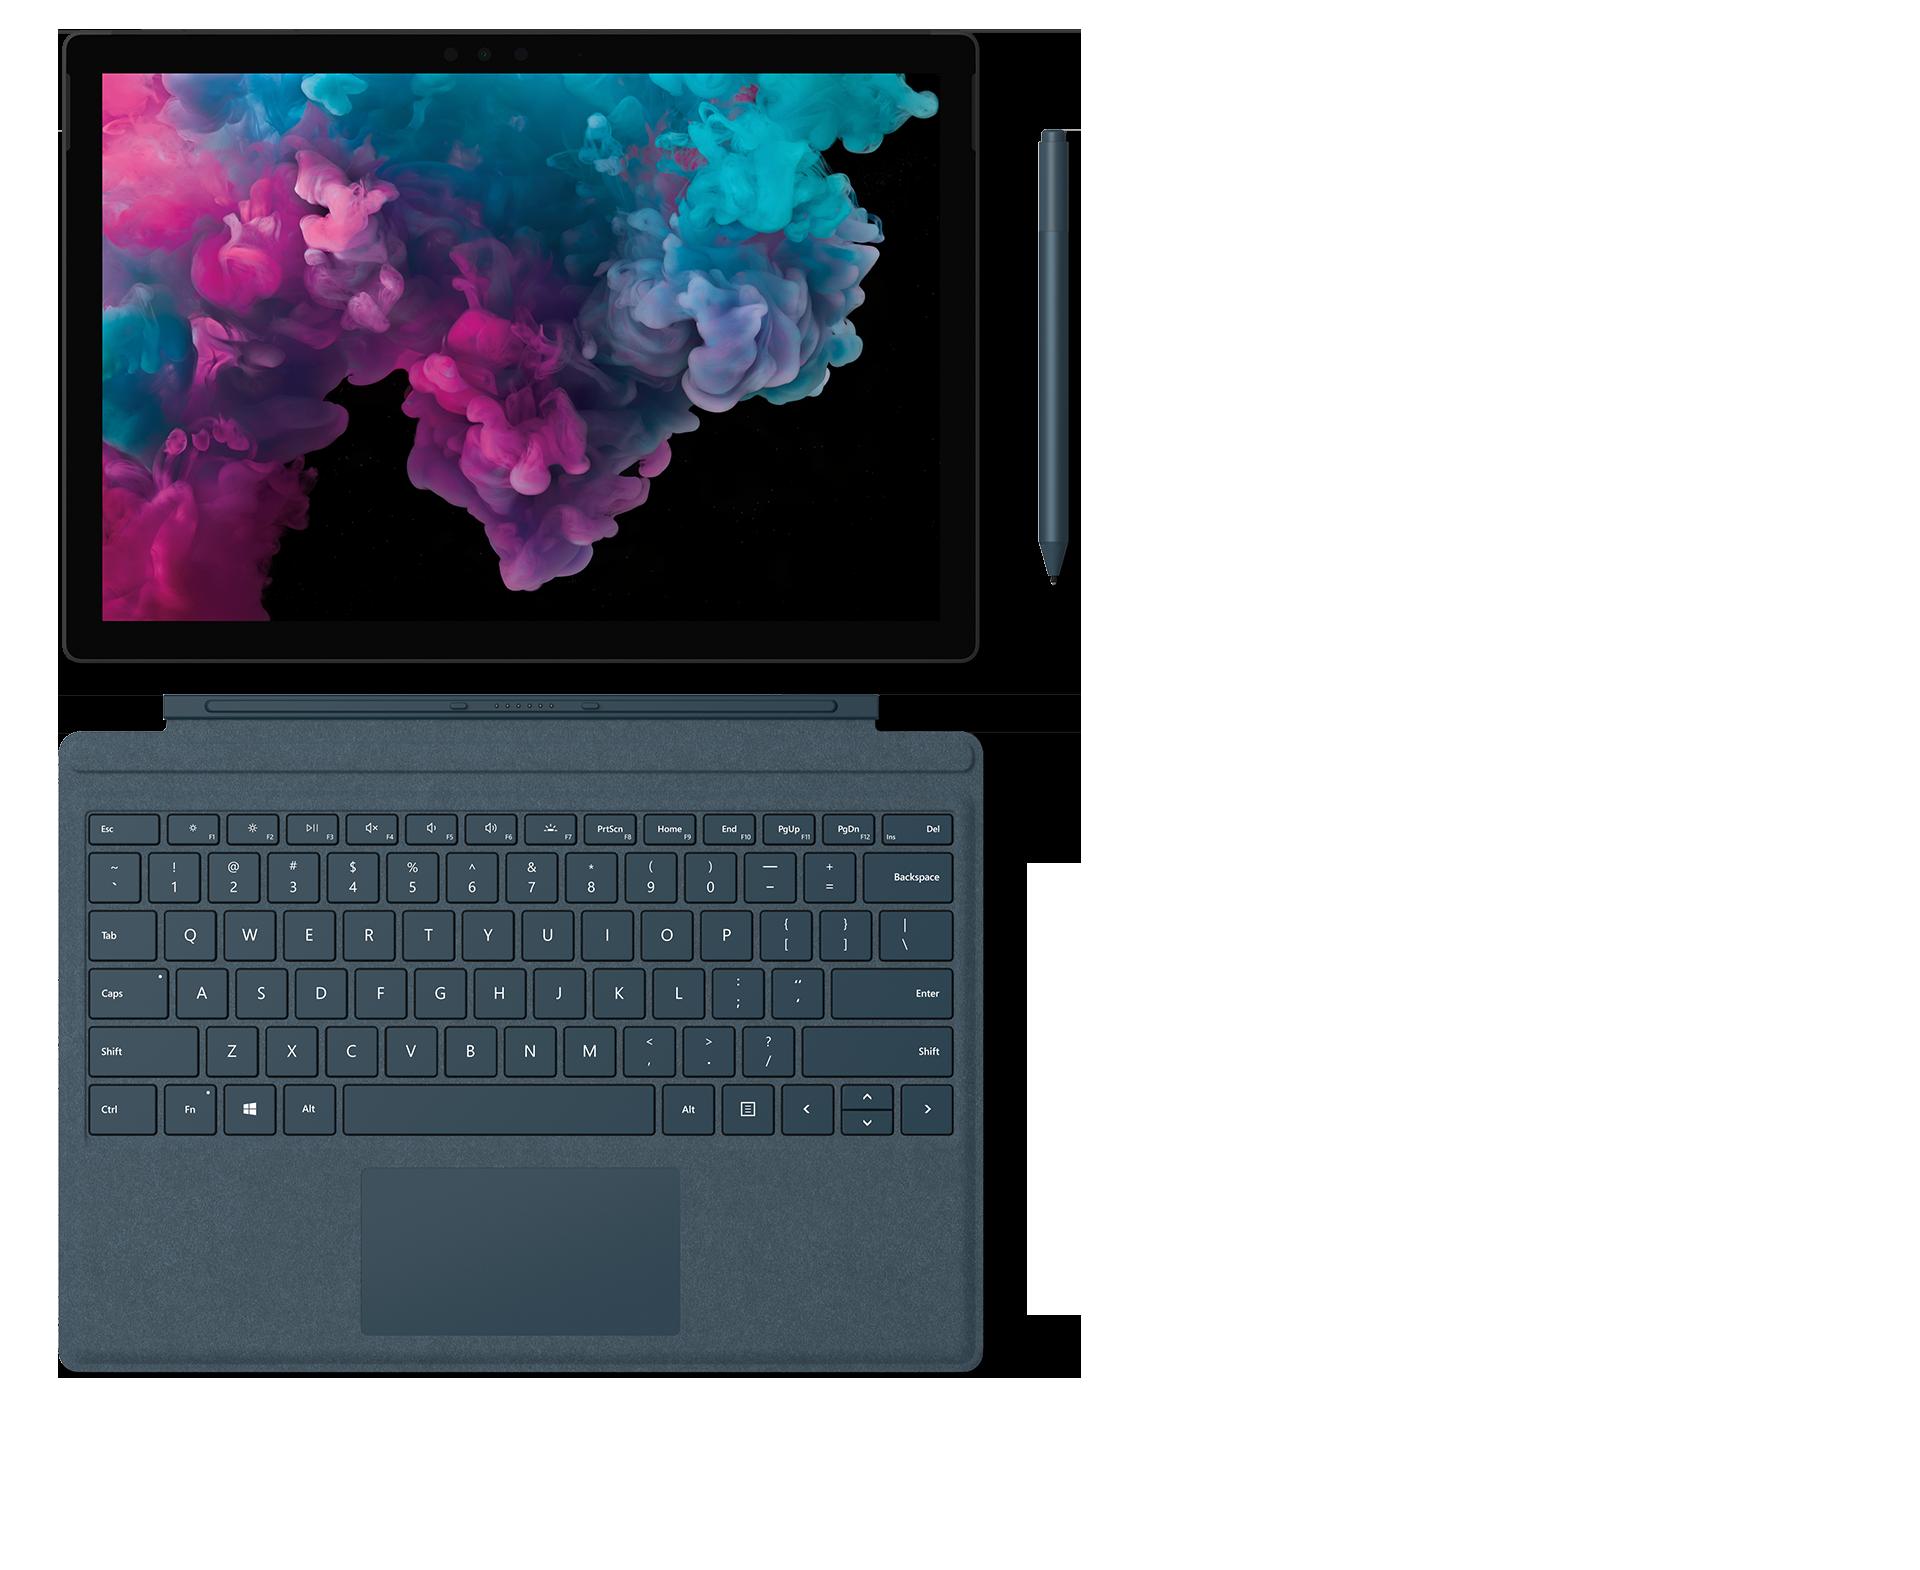 配备 Surface 专业键盘盖、Surface 触控笔和 Surface Arc Mouse 鼠标的 Surface Pro 6。